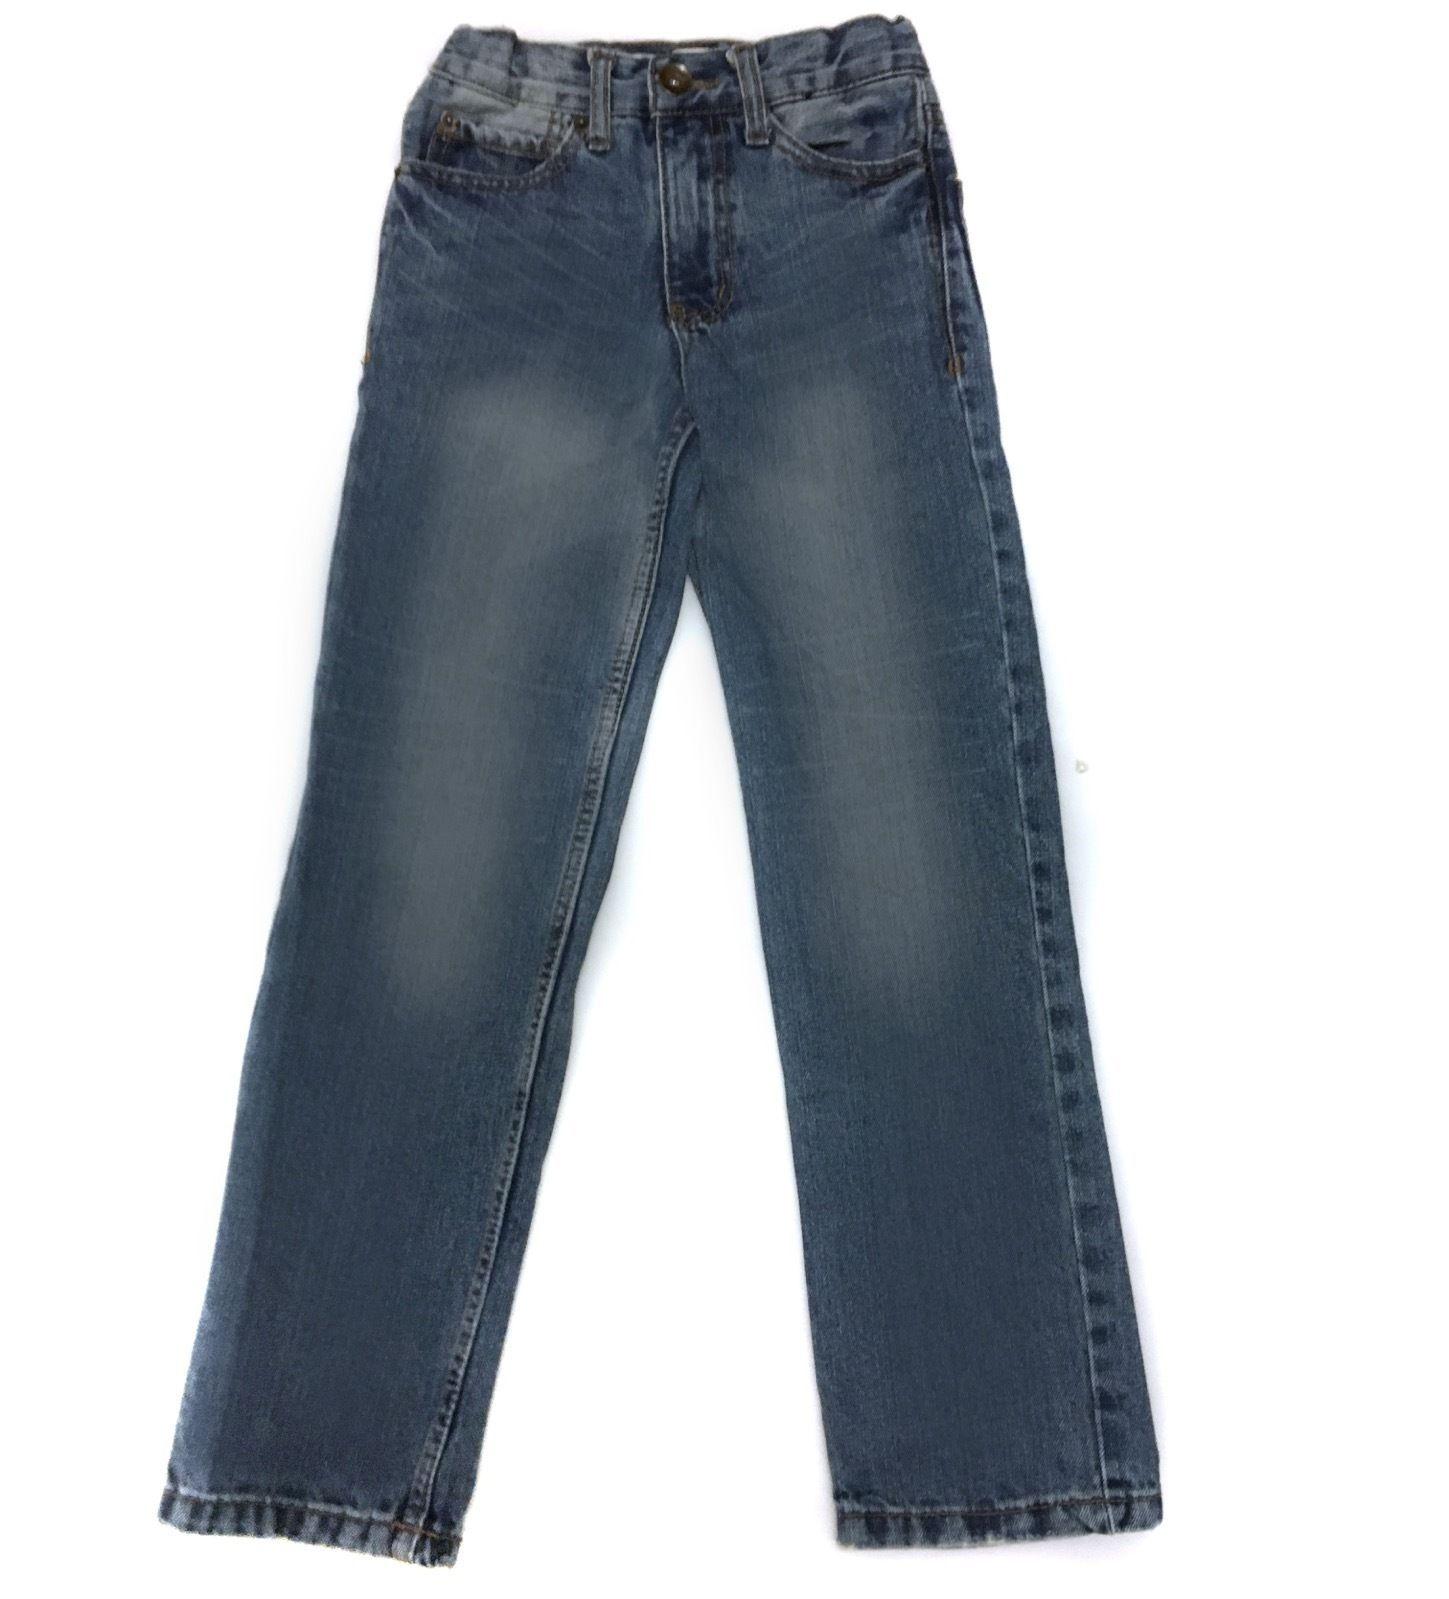 Cherokee Straight leg Blue Jeans Pants Denim Boys 8 S Slim